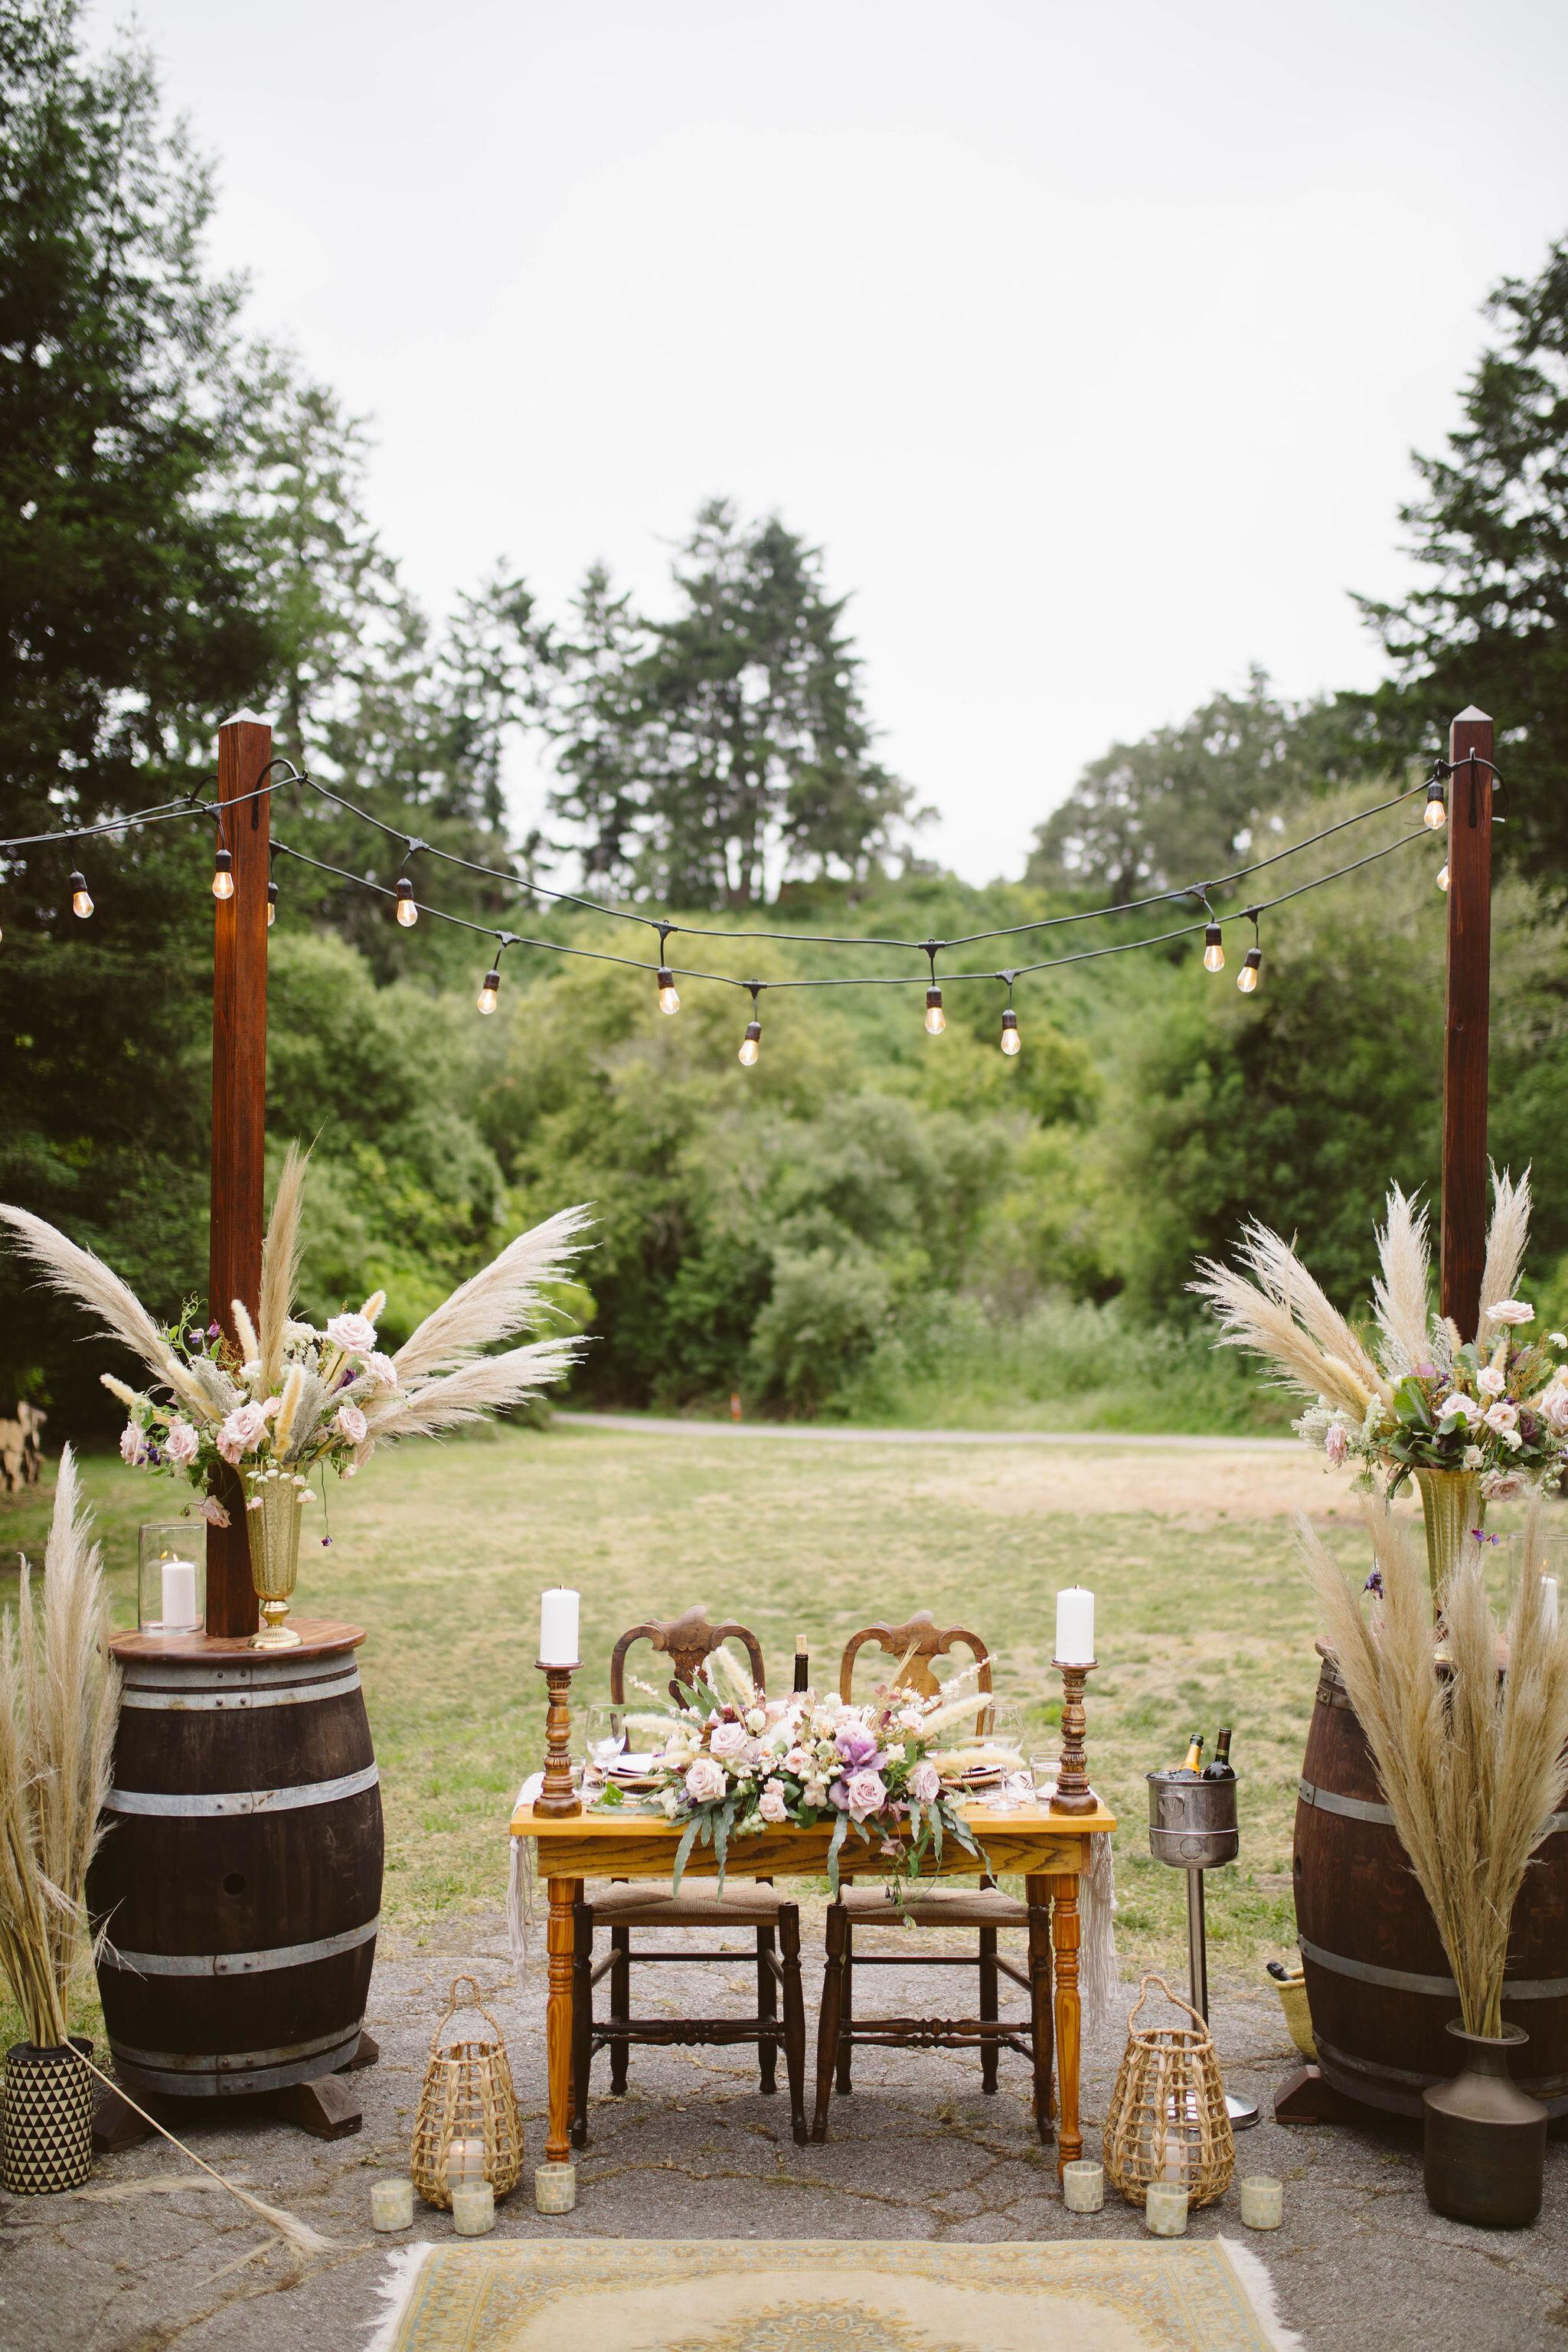 Venture-Retreat-Center-Wedding-Pescadero-Sat-Aaron-Pritam-The-Shalom-Imaginative-543.jpg